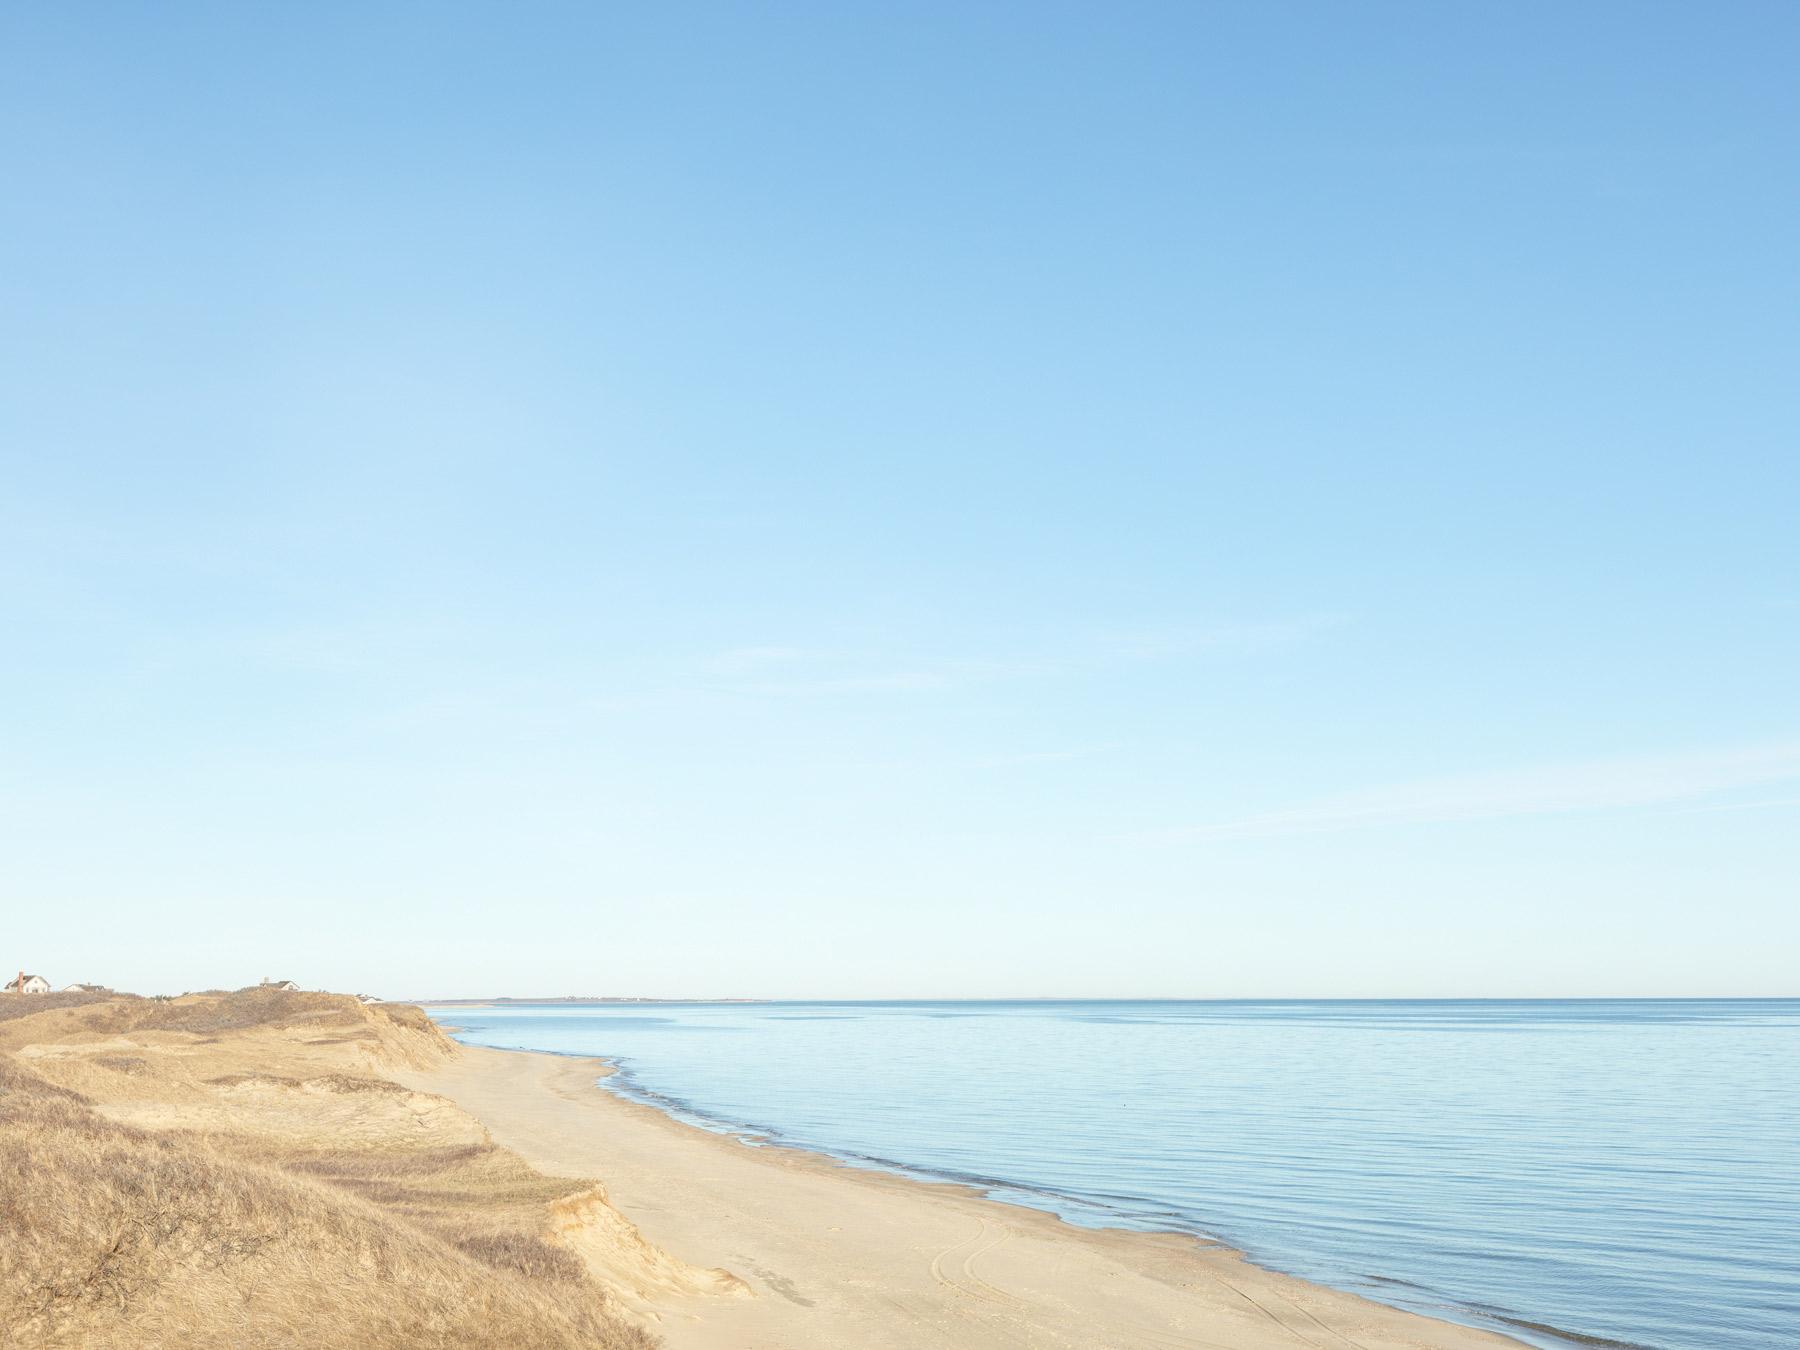 Dionis-Dunes---April-C0951.jpg